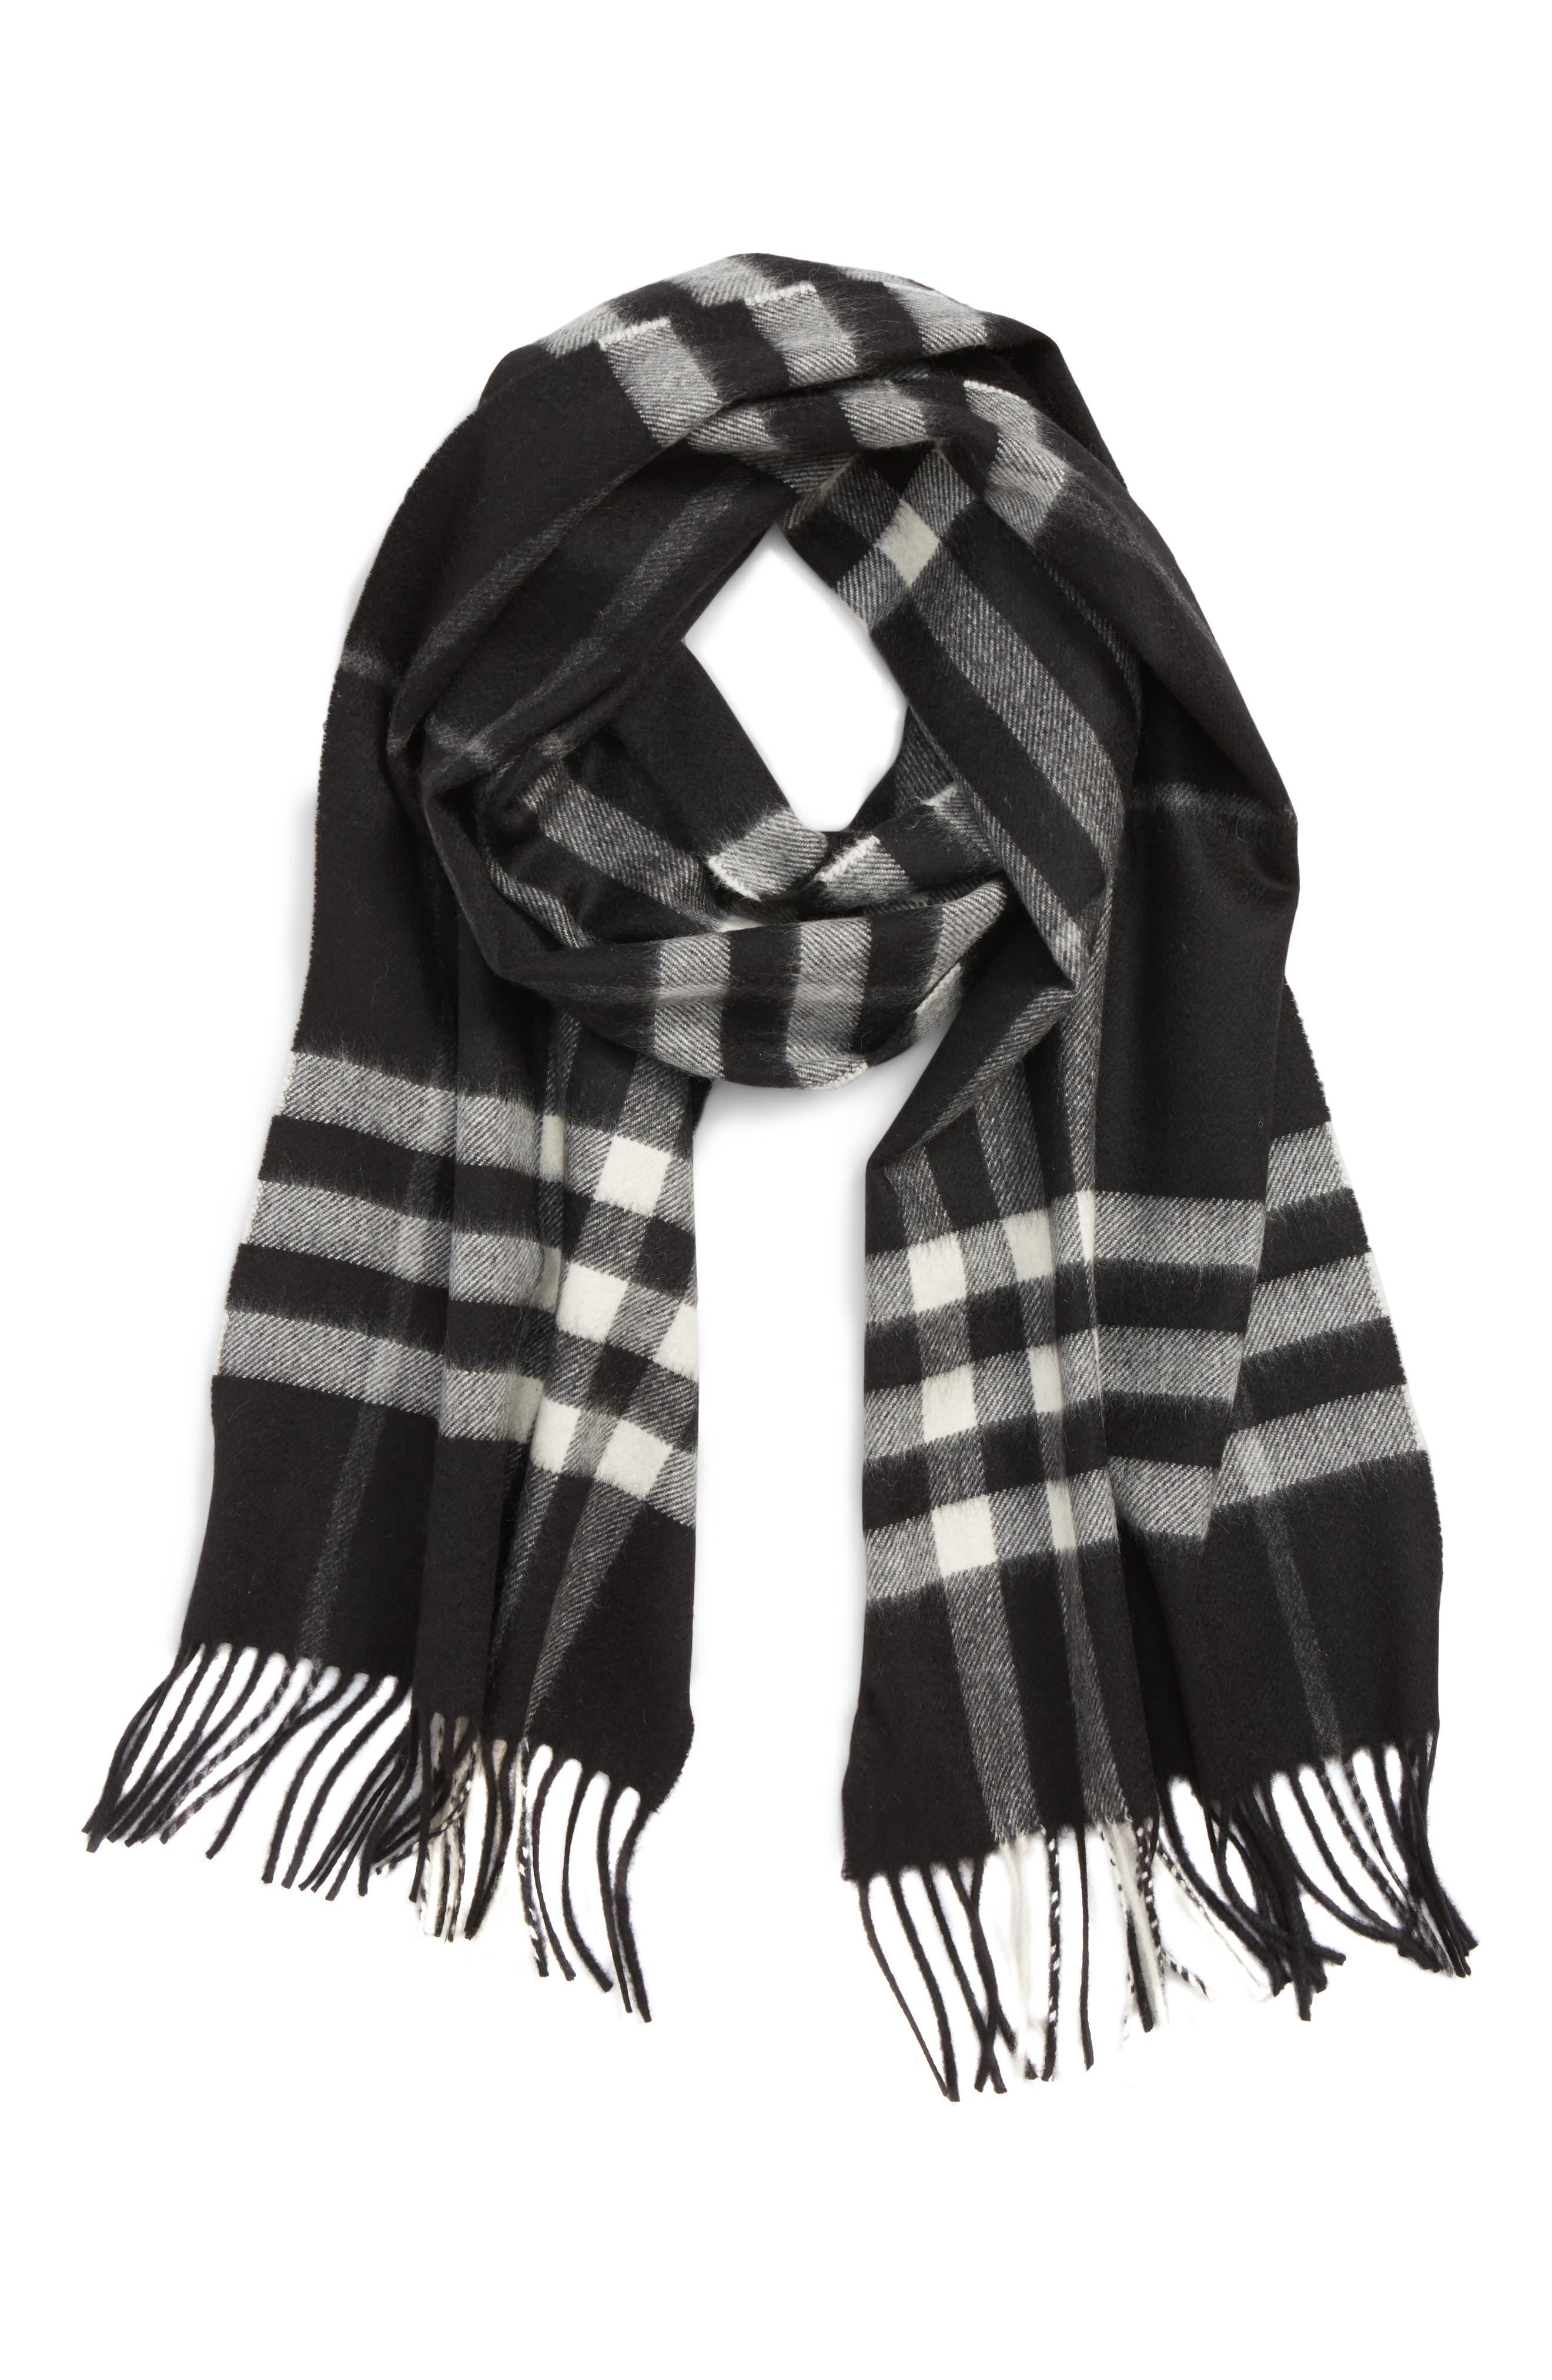 81093fe28e090 Men's Scarves: Silk, Cashmere, Modal, Wool & More | Nordstrom